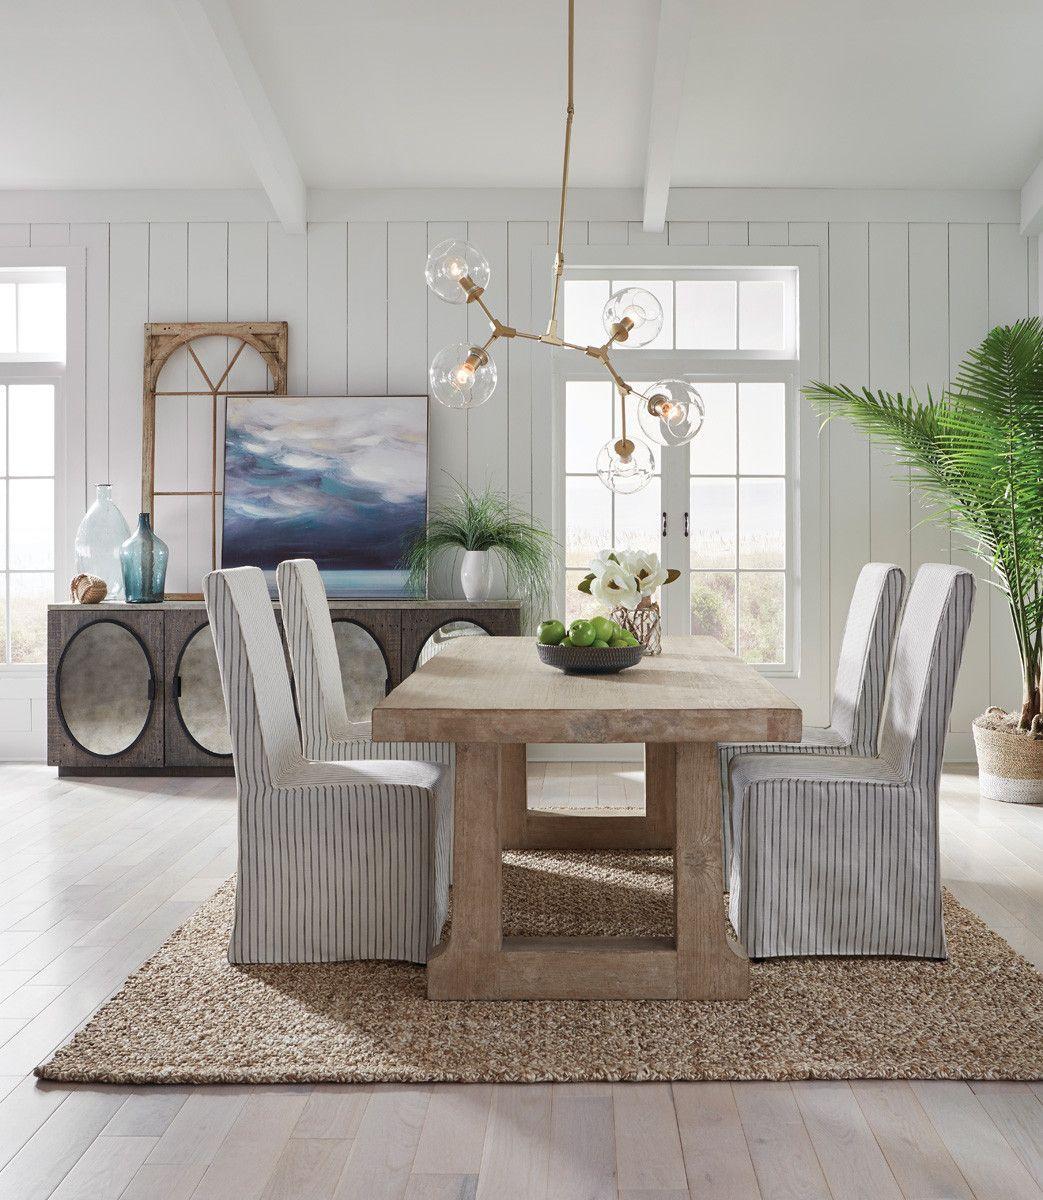 Classichome Interior Design: Palmer Dining Table 94